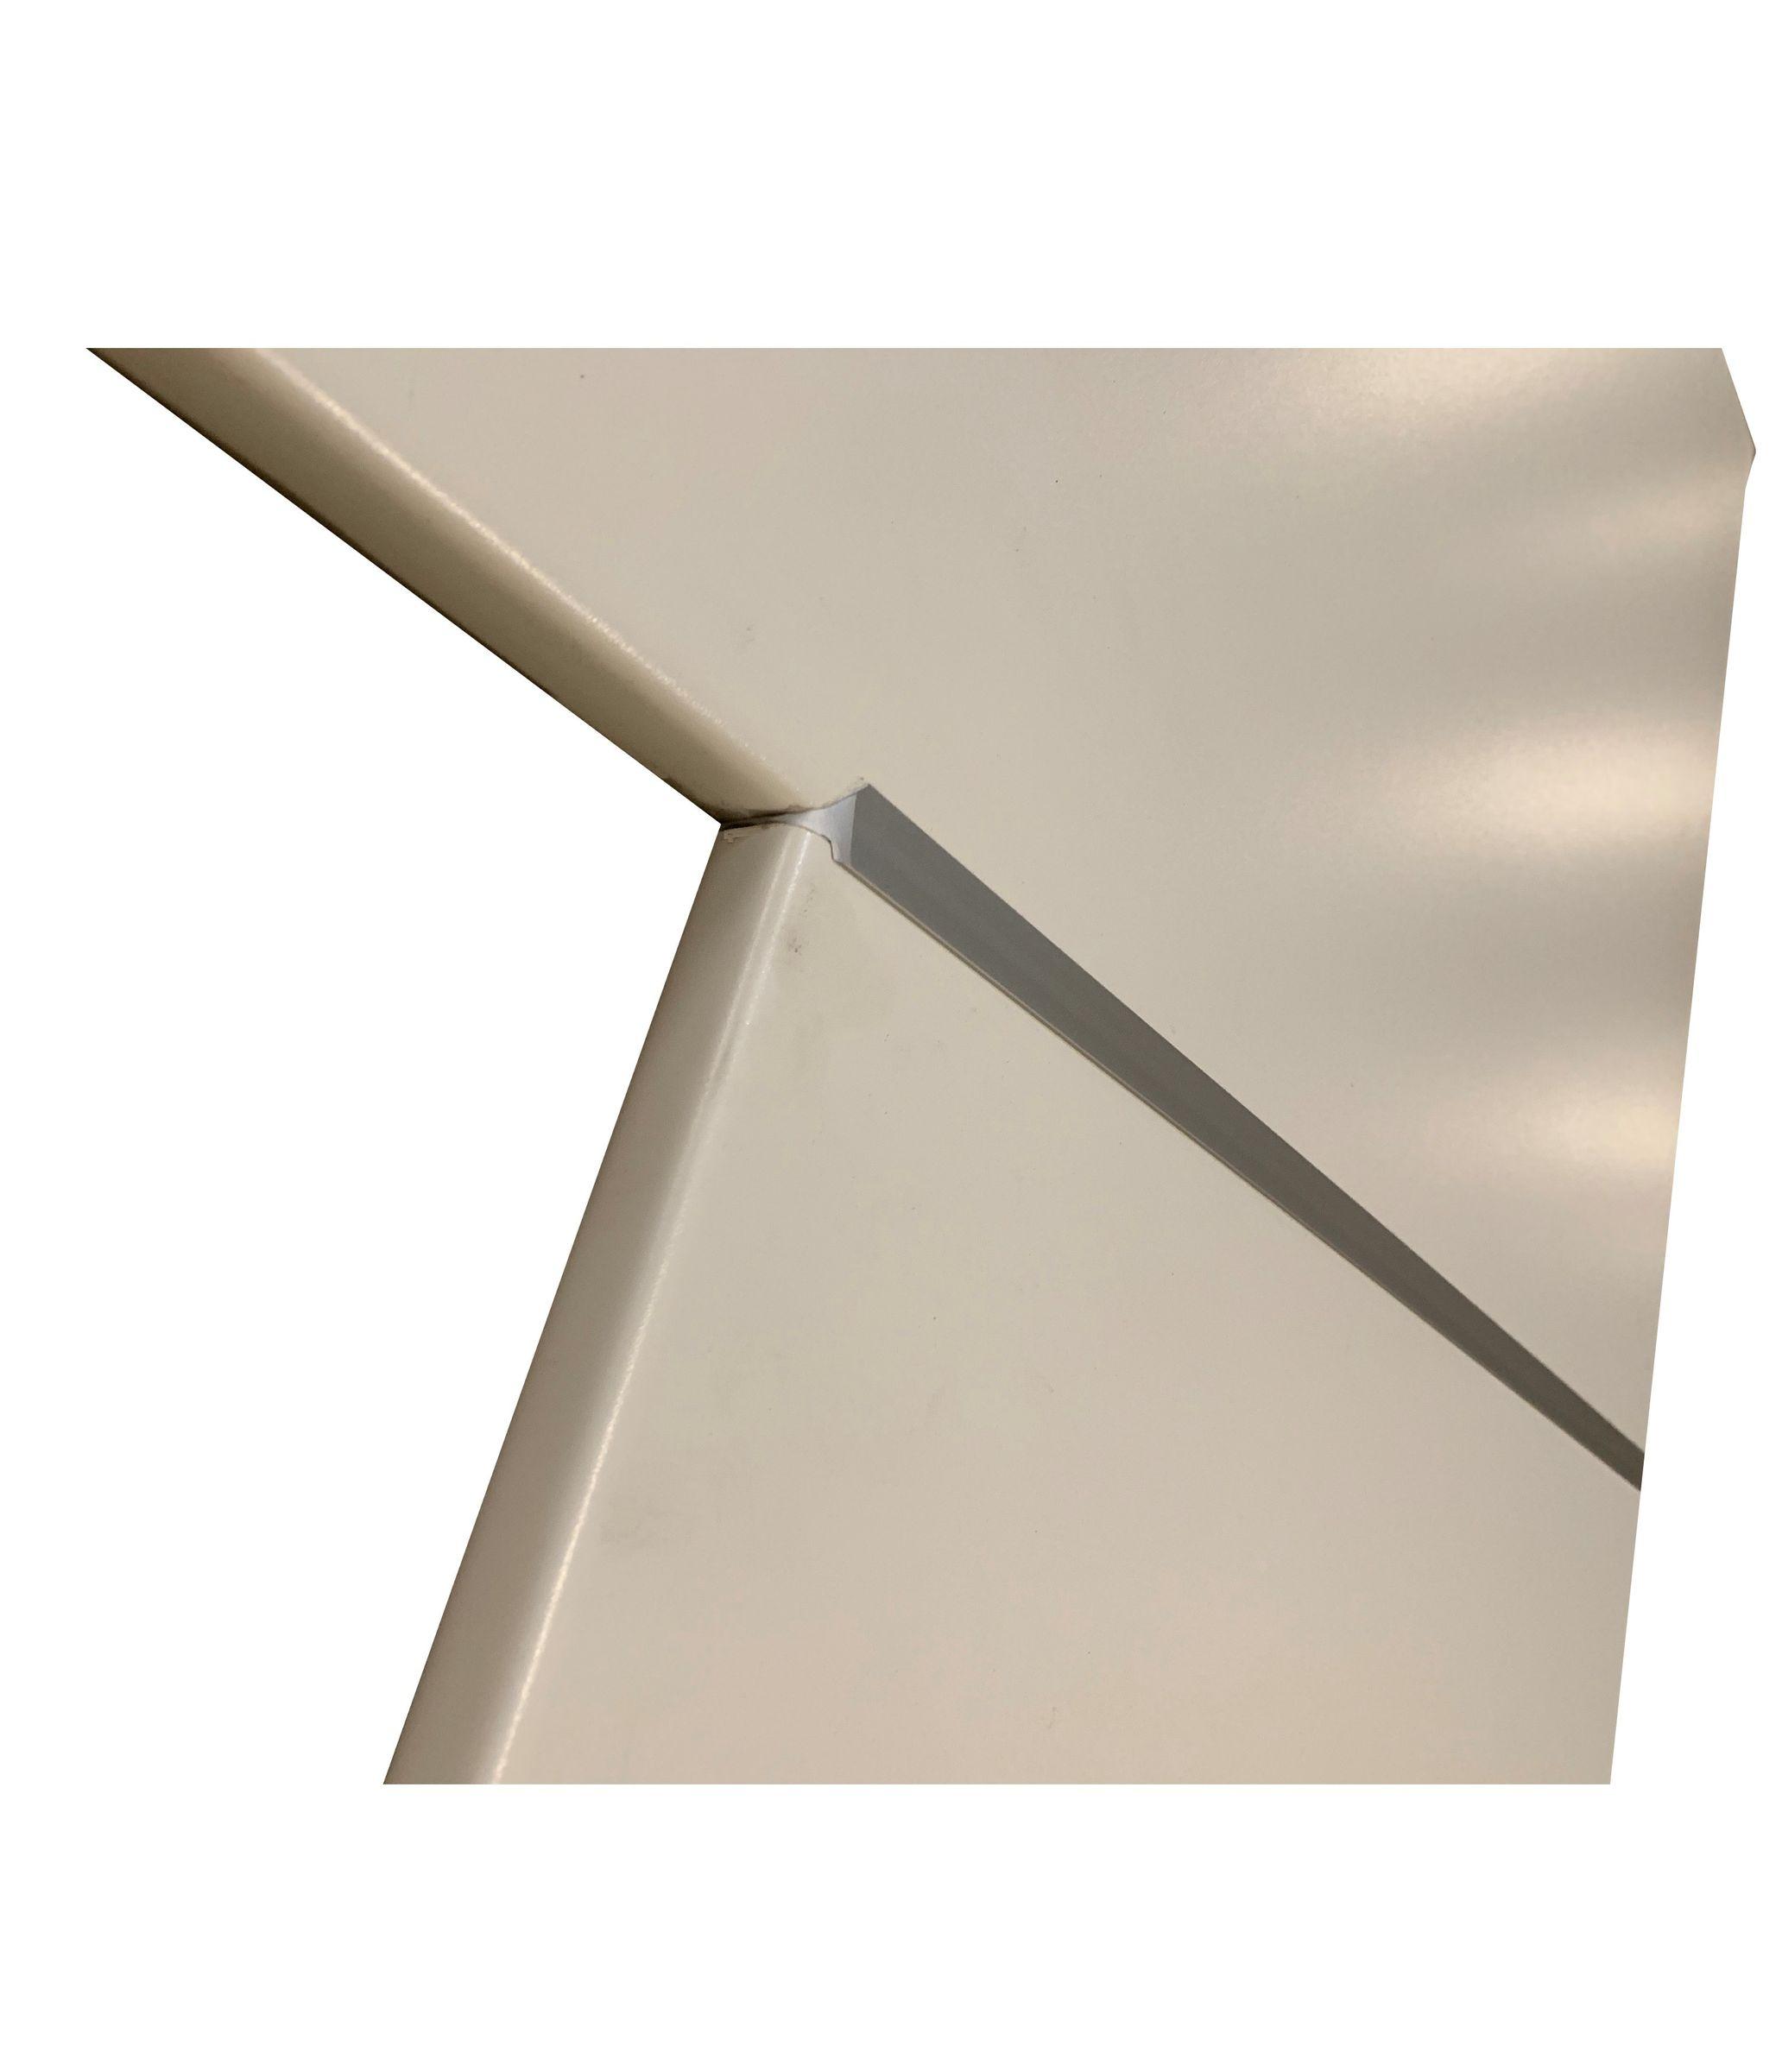 Eckverbindungsschiene Aluminium 28 Mm Arbeitsplatten Schiene Fur Eck Verbindung Kuechen Preisbombe